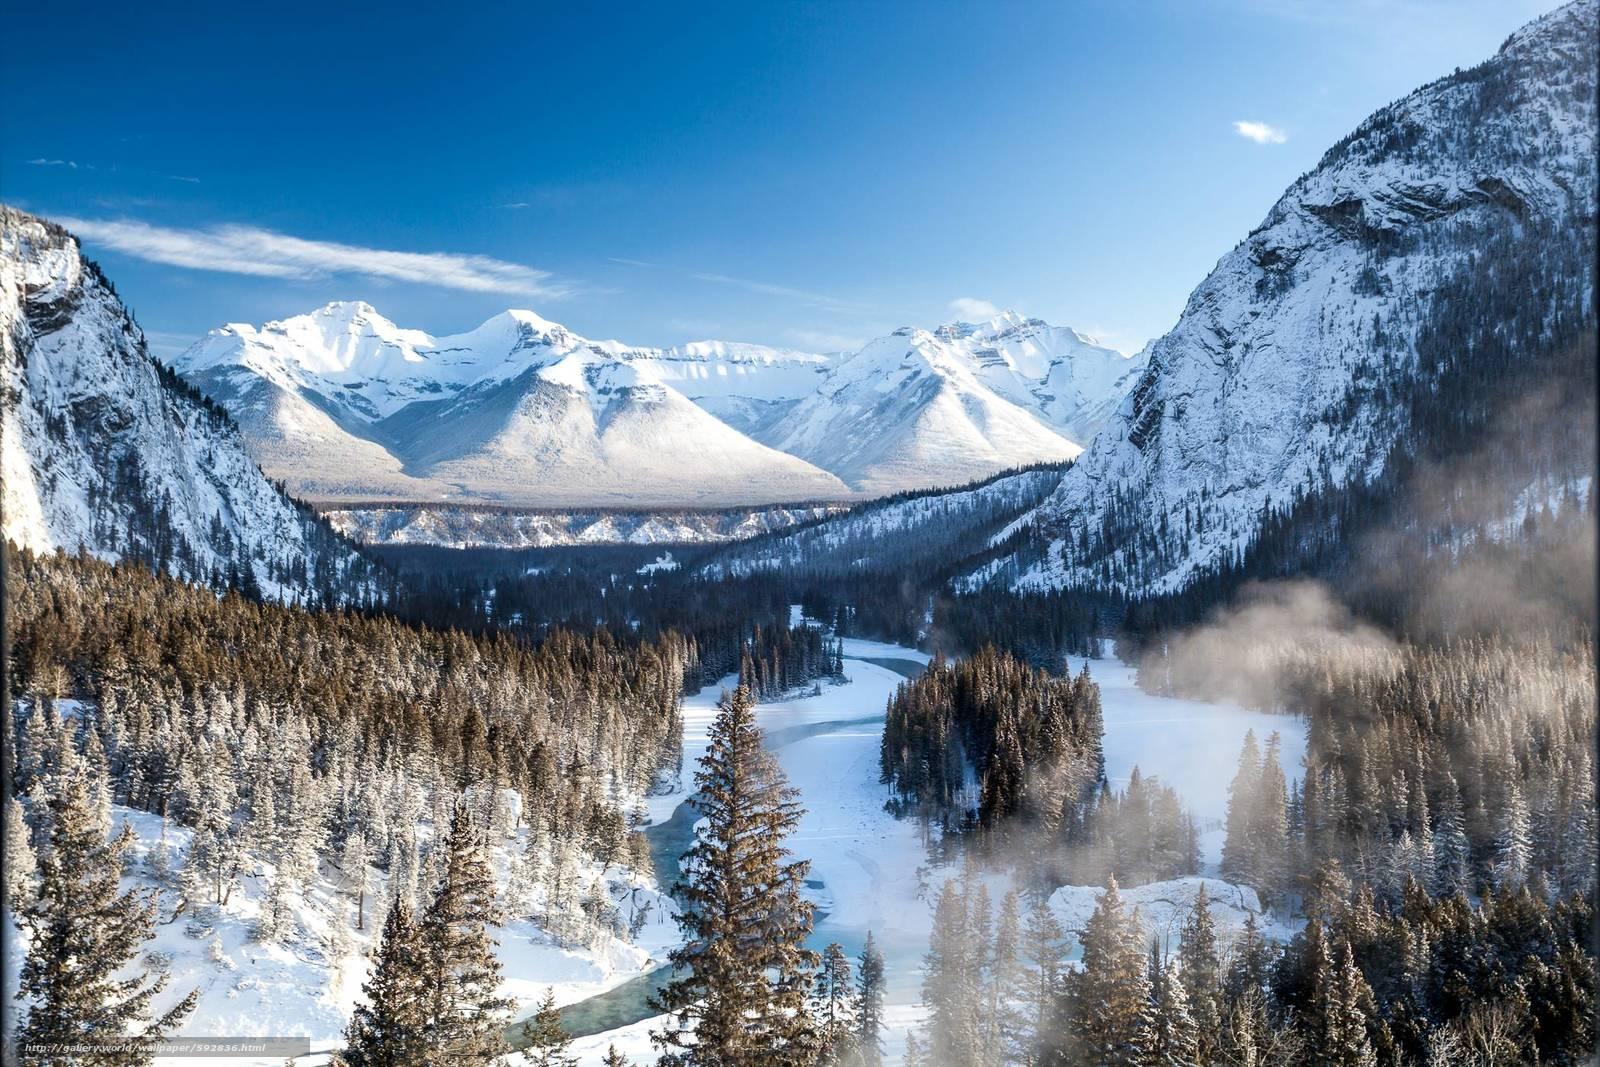 Numa Falls Canada Wallpaper Download Wallpaper Mountains Winter River Banff Free